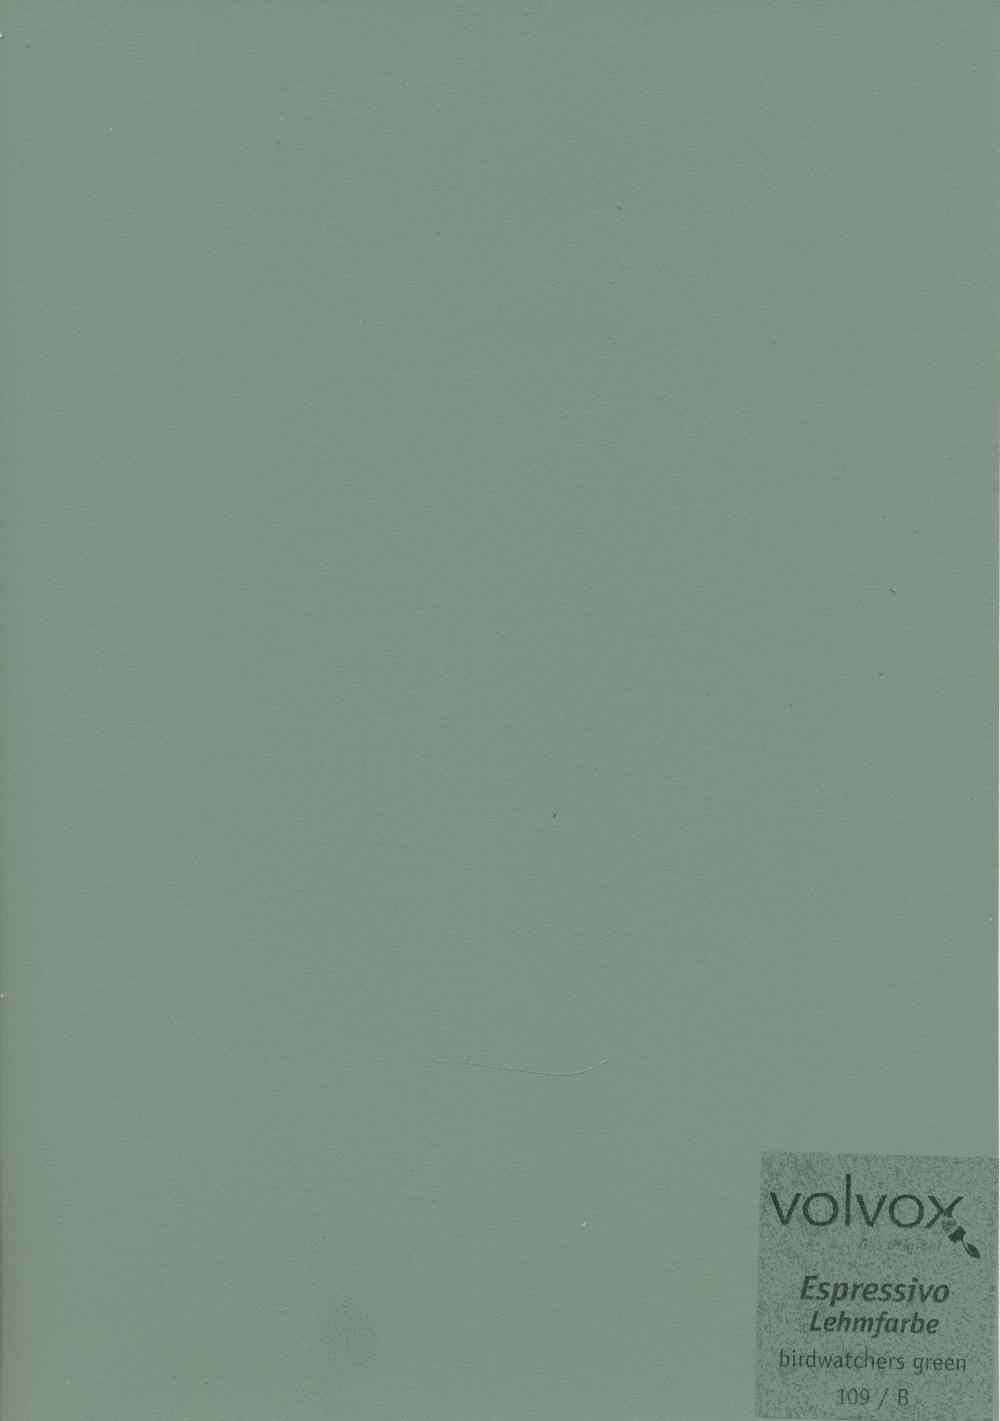 Volvox Espressivo Lehmfarbe 109 birdwatchers green